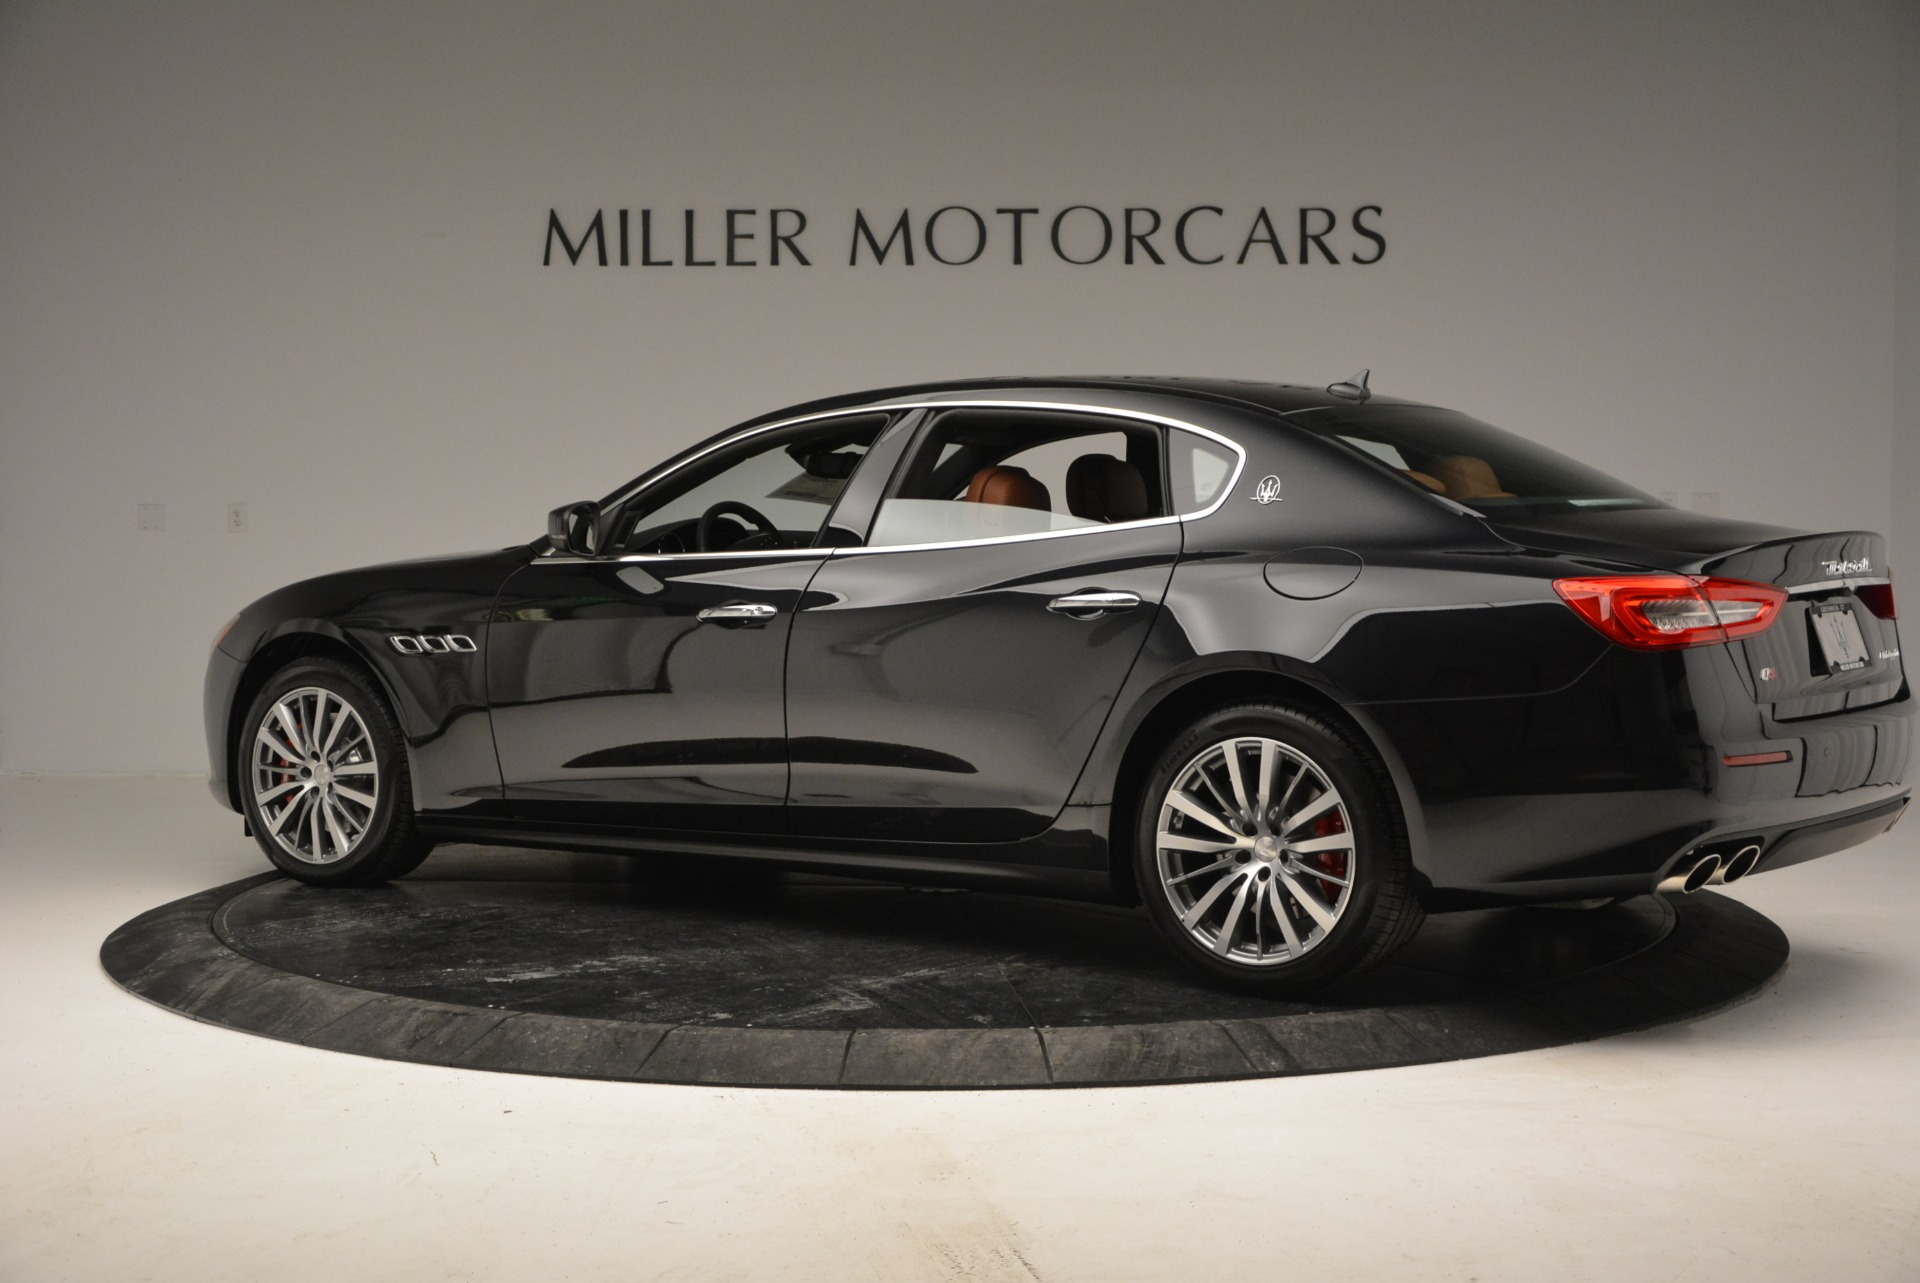 New 2018 Maserati Quattroporte S Q4 For Sale () | Miller Motorcars Stock #W574